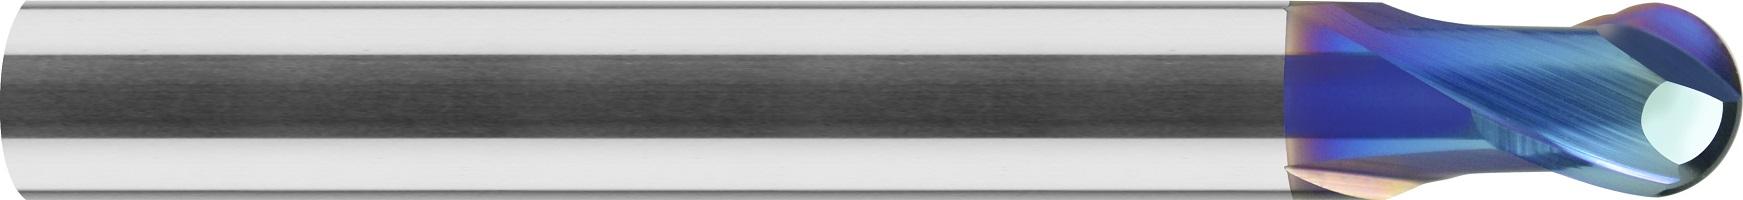 Frez kulowy, Z-2, 65 HRC, Dynastar, VHM naco blue (403)